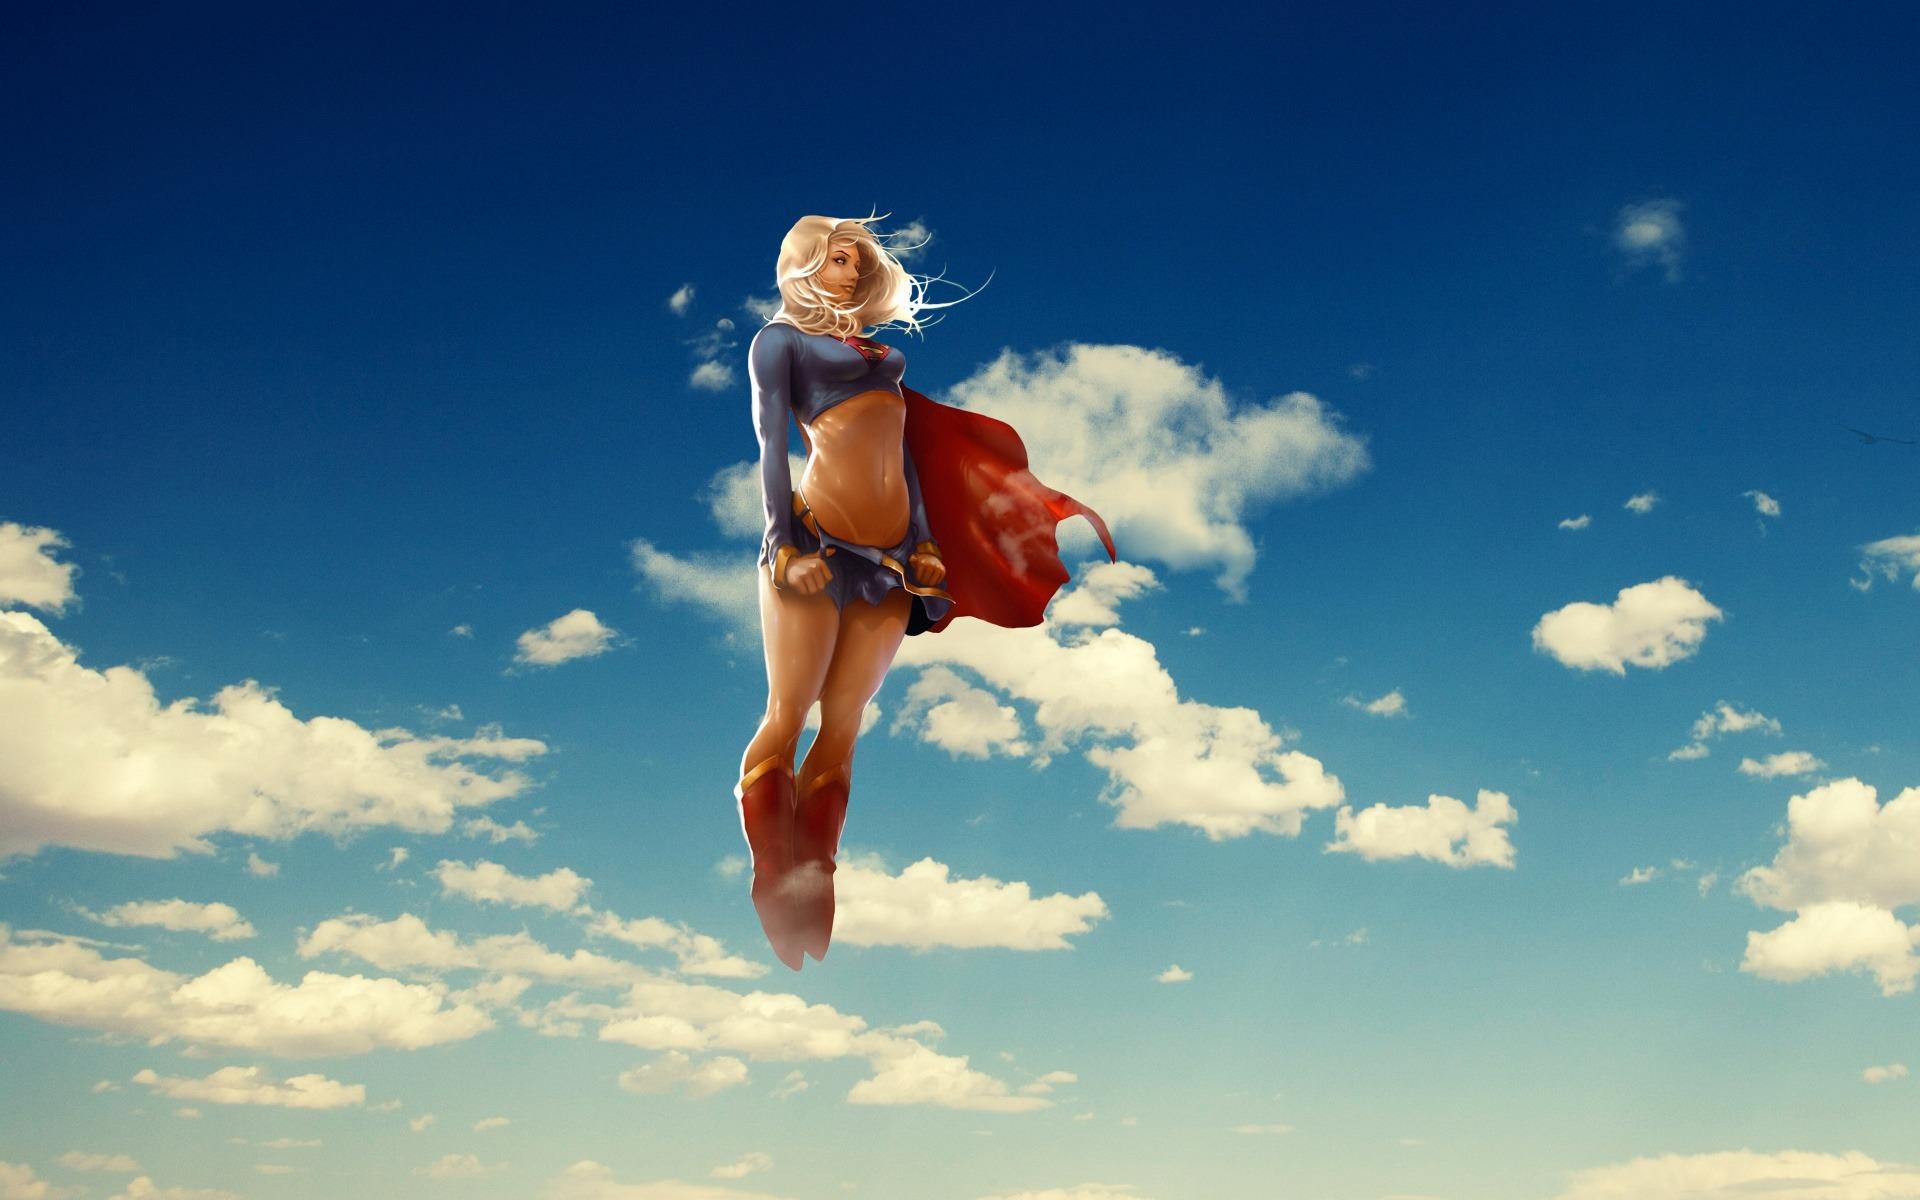 supergirl-3d creative design desktop wallpaper preview | 10wallpaper